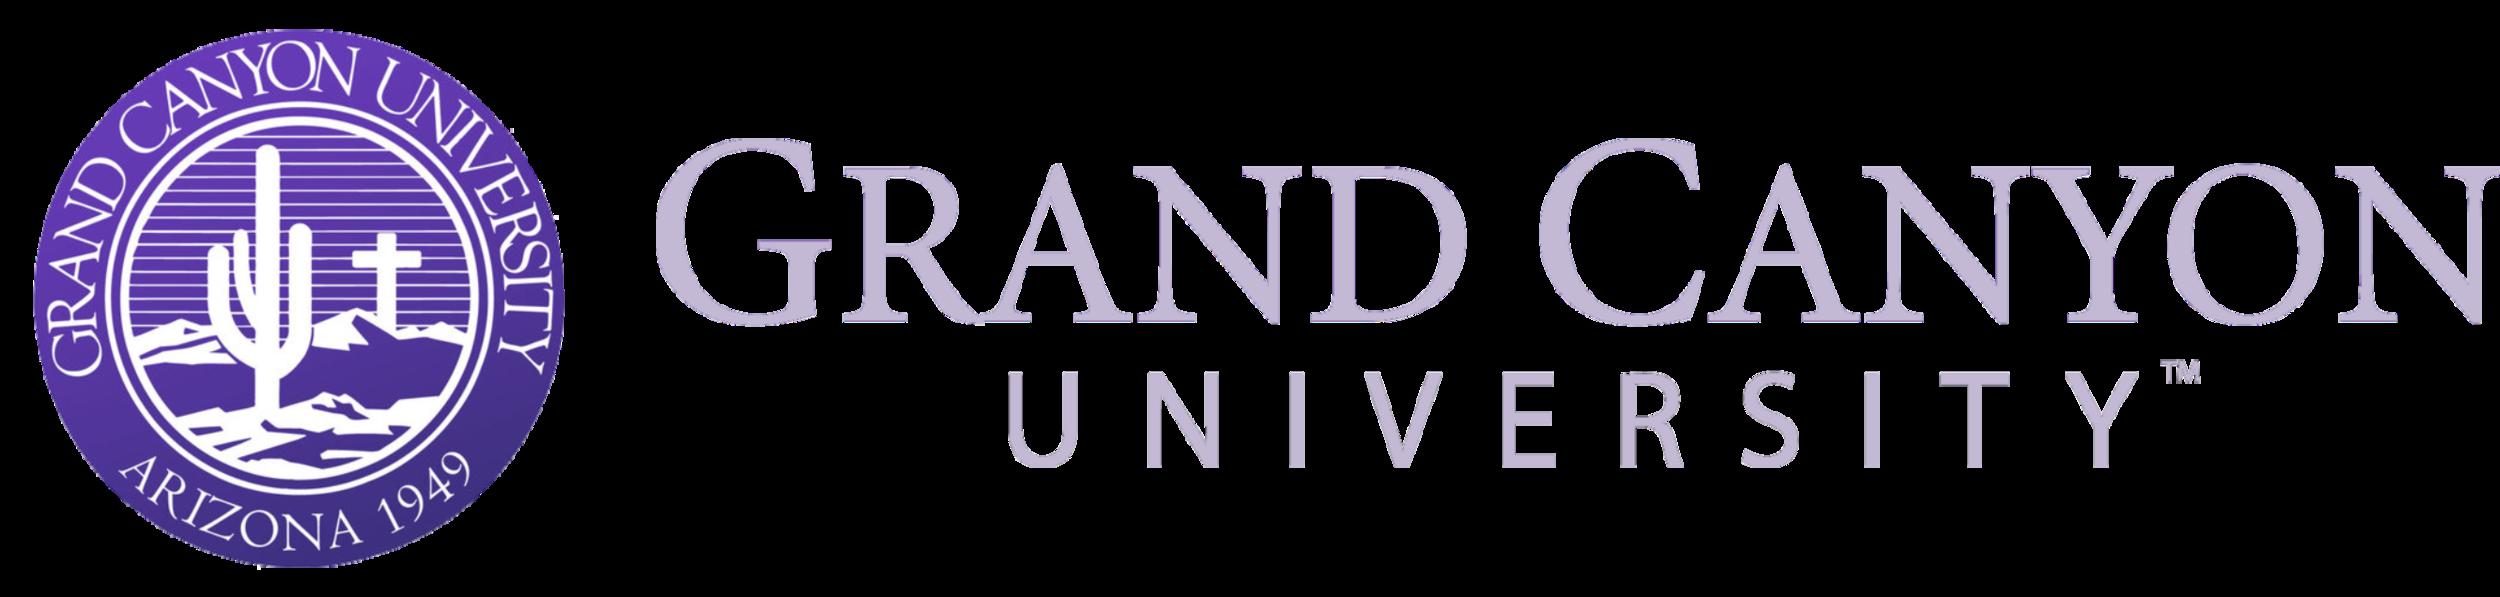 GCU-Logo-Circle-plus-Light-Purple.png